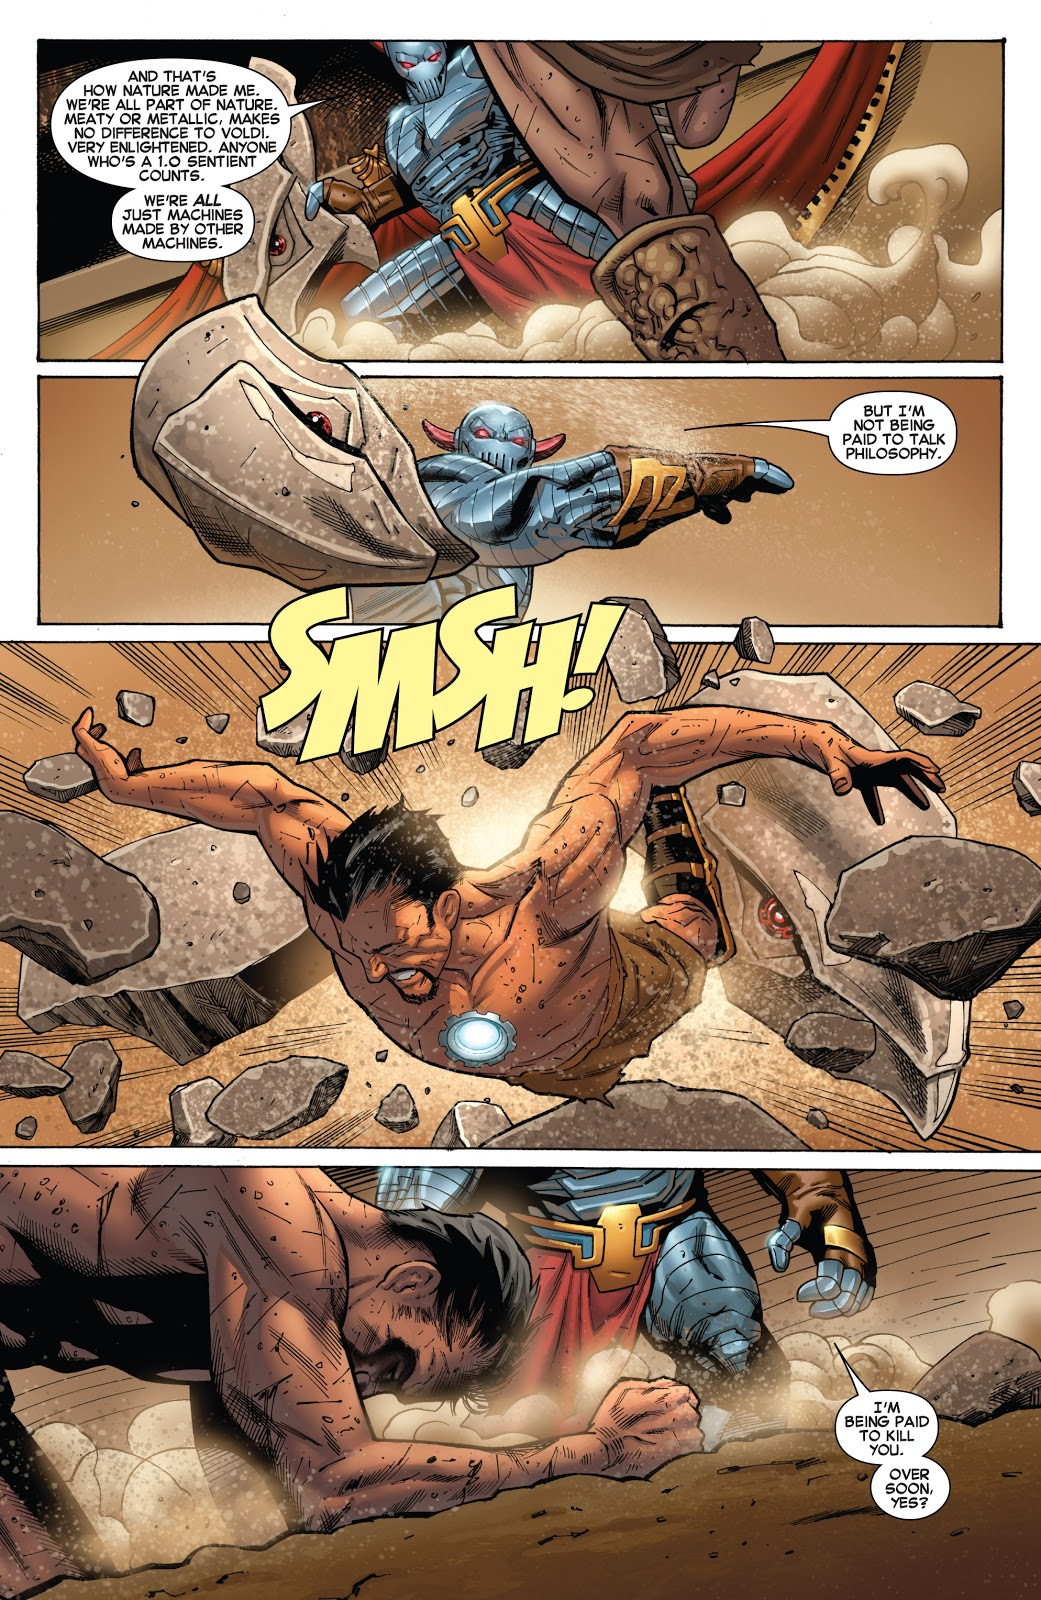 Iron Man The Secret Origin of Tony Stark Book 1 review